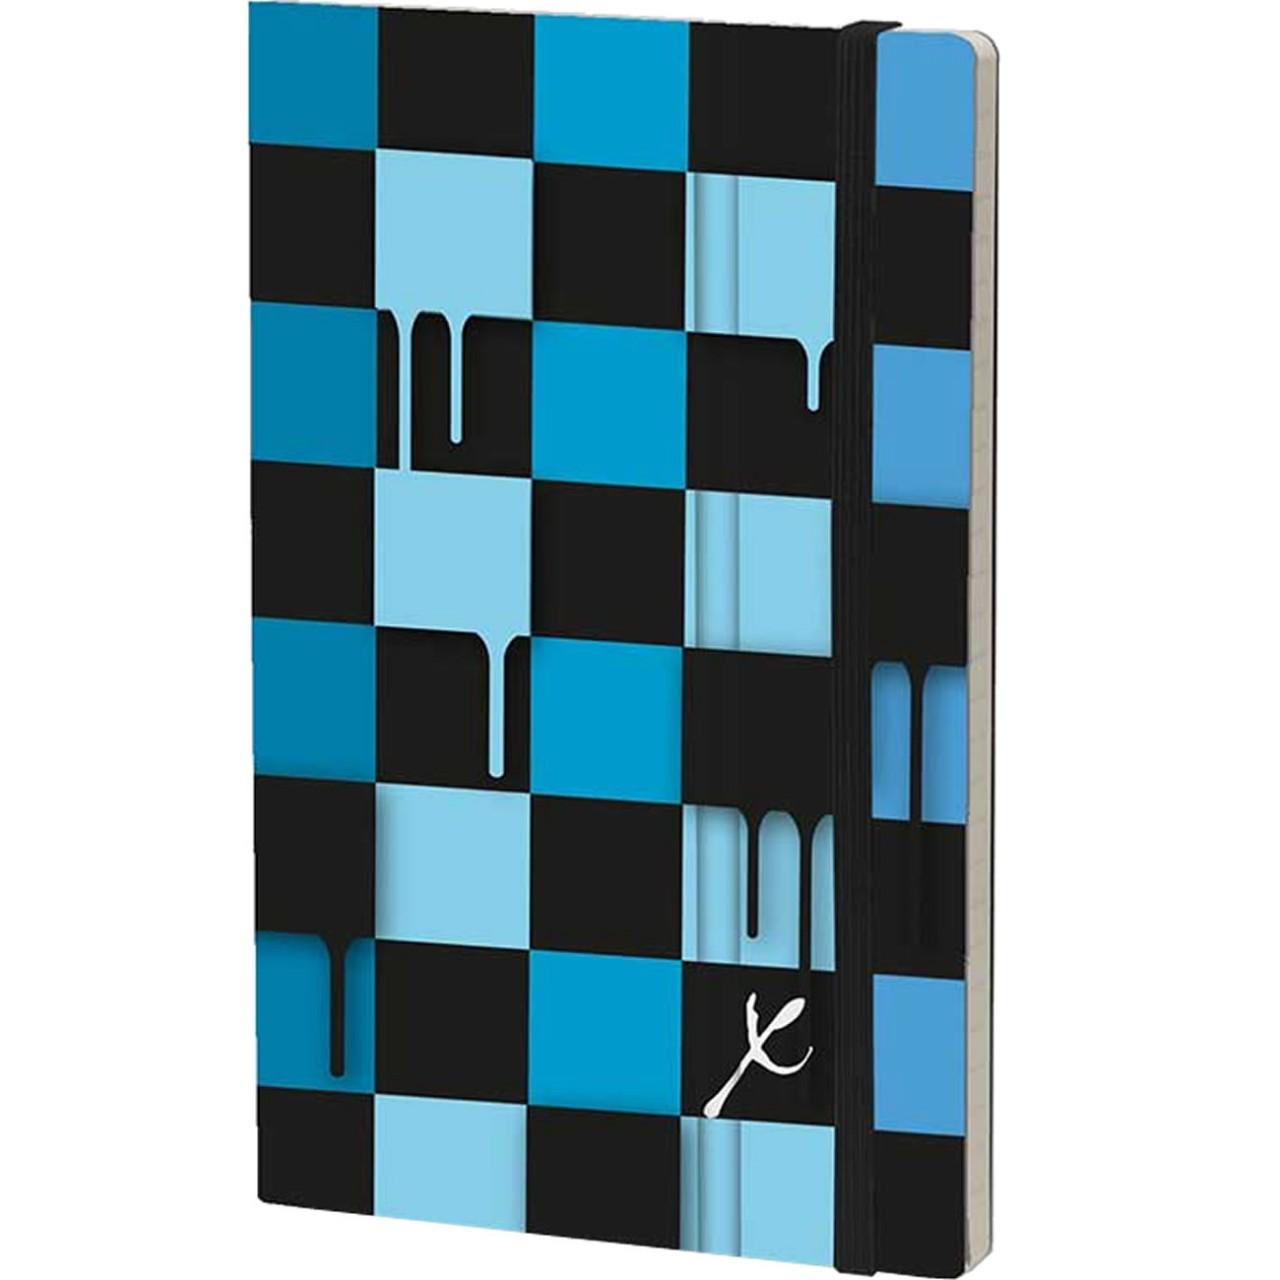 Stifflexible Notizbuch CHESS 13 x 21 cm 192 S., BLUE